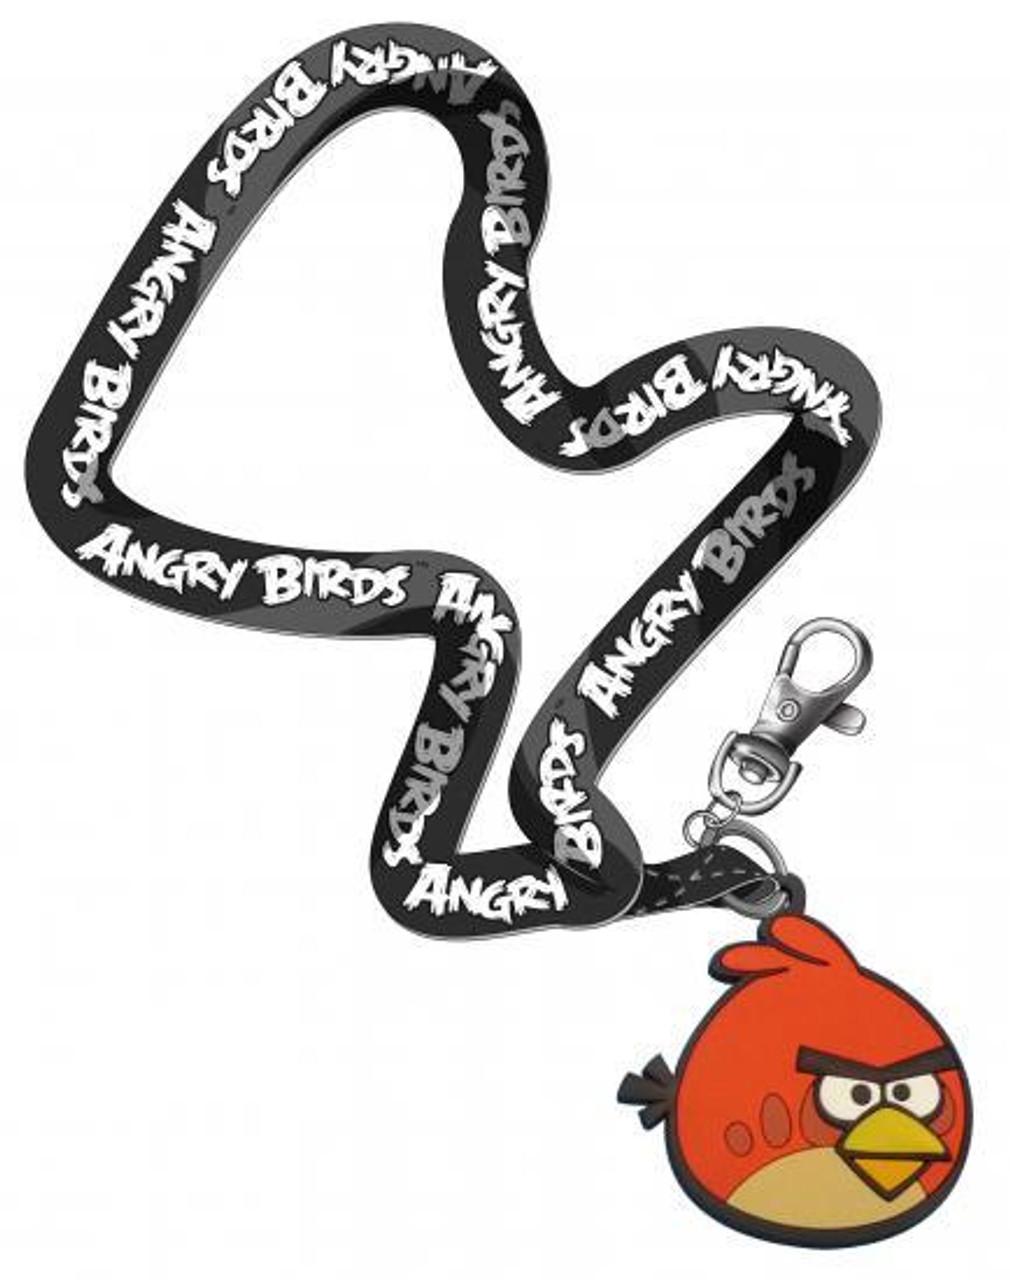 Angry Birds Red Bird Lanyard Keychain